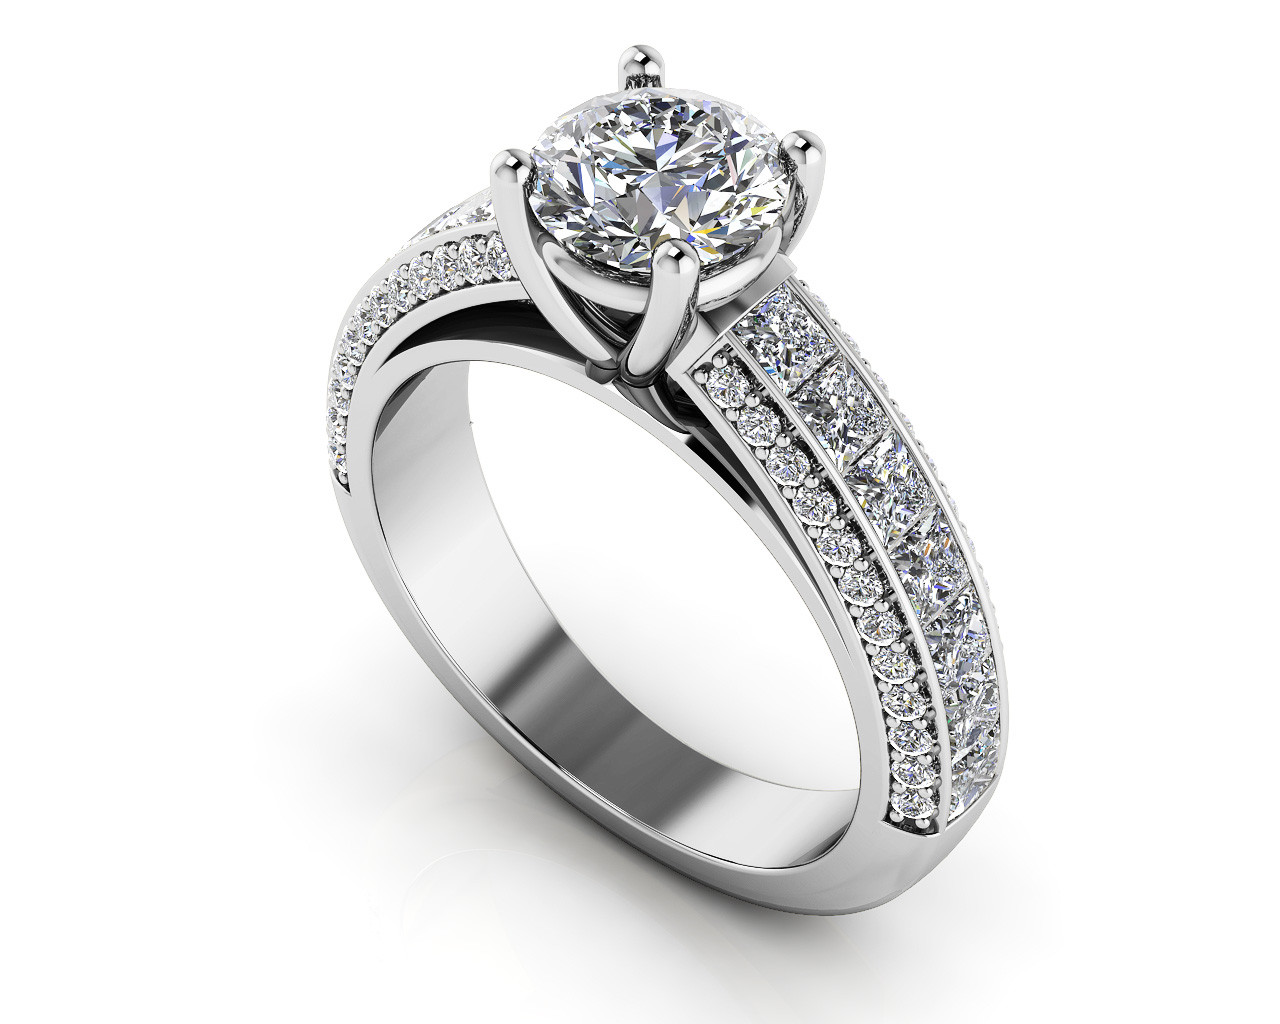 Round Princess Cut Engagement Ring Buy Custom Engagement Rings